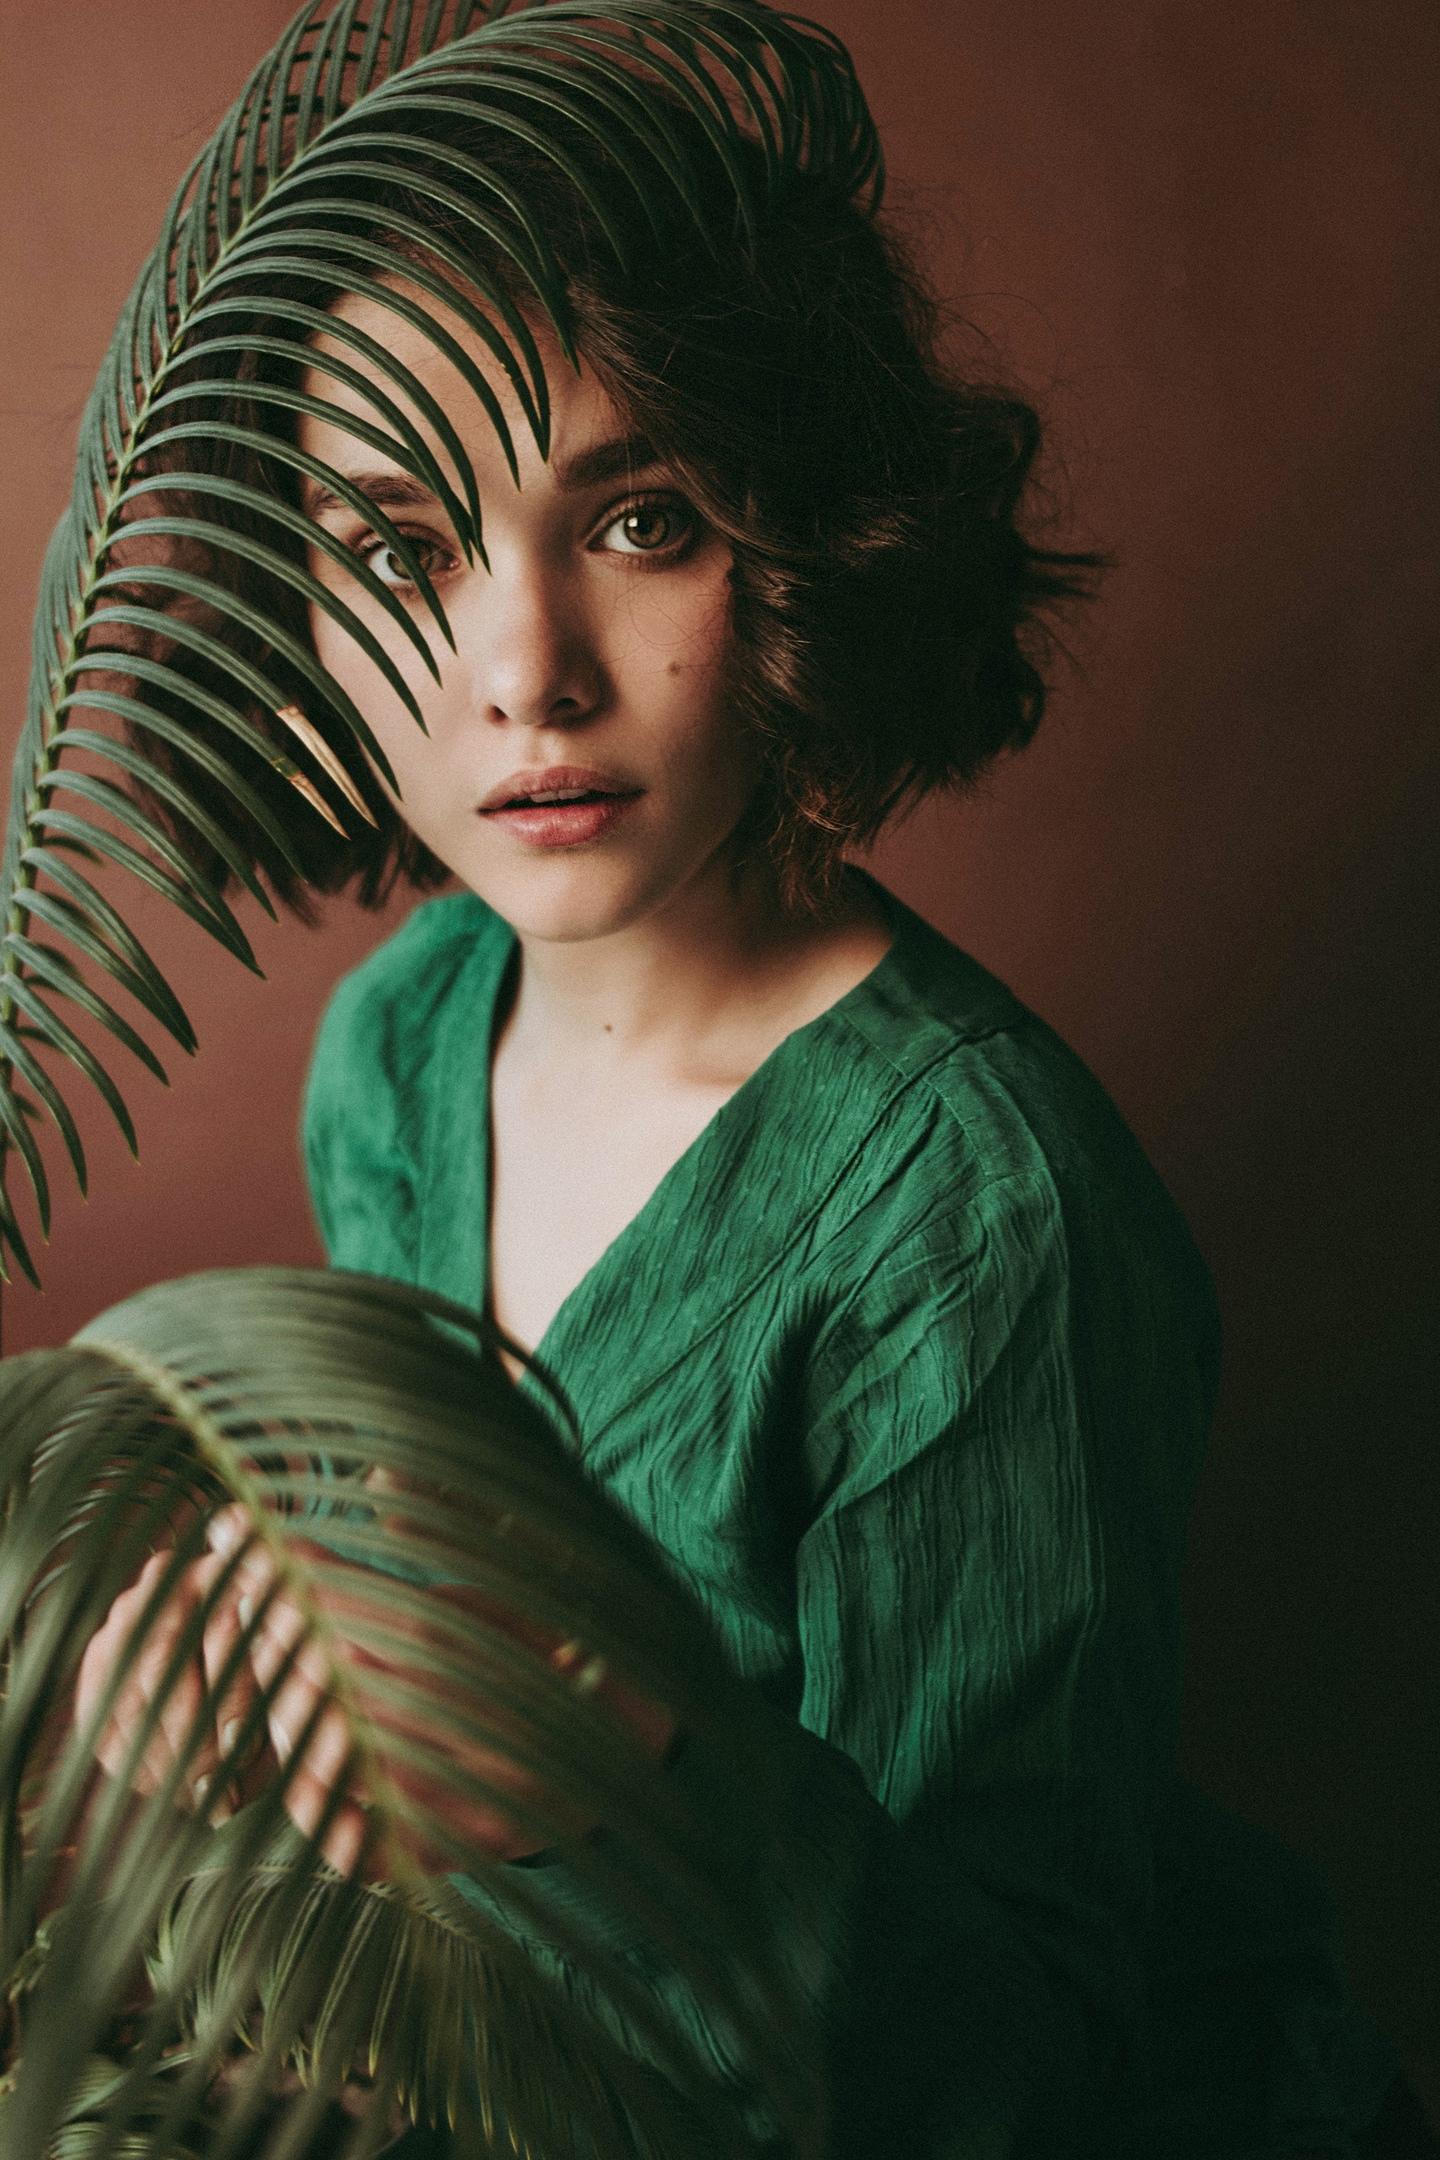 http://instagram.com/youngfolks_ru